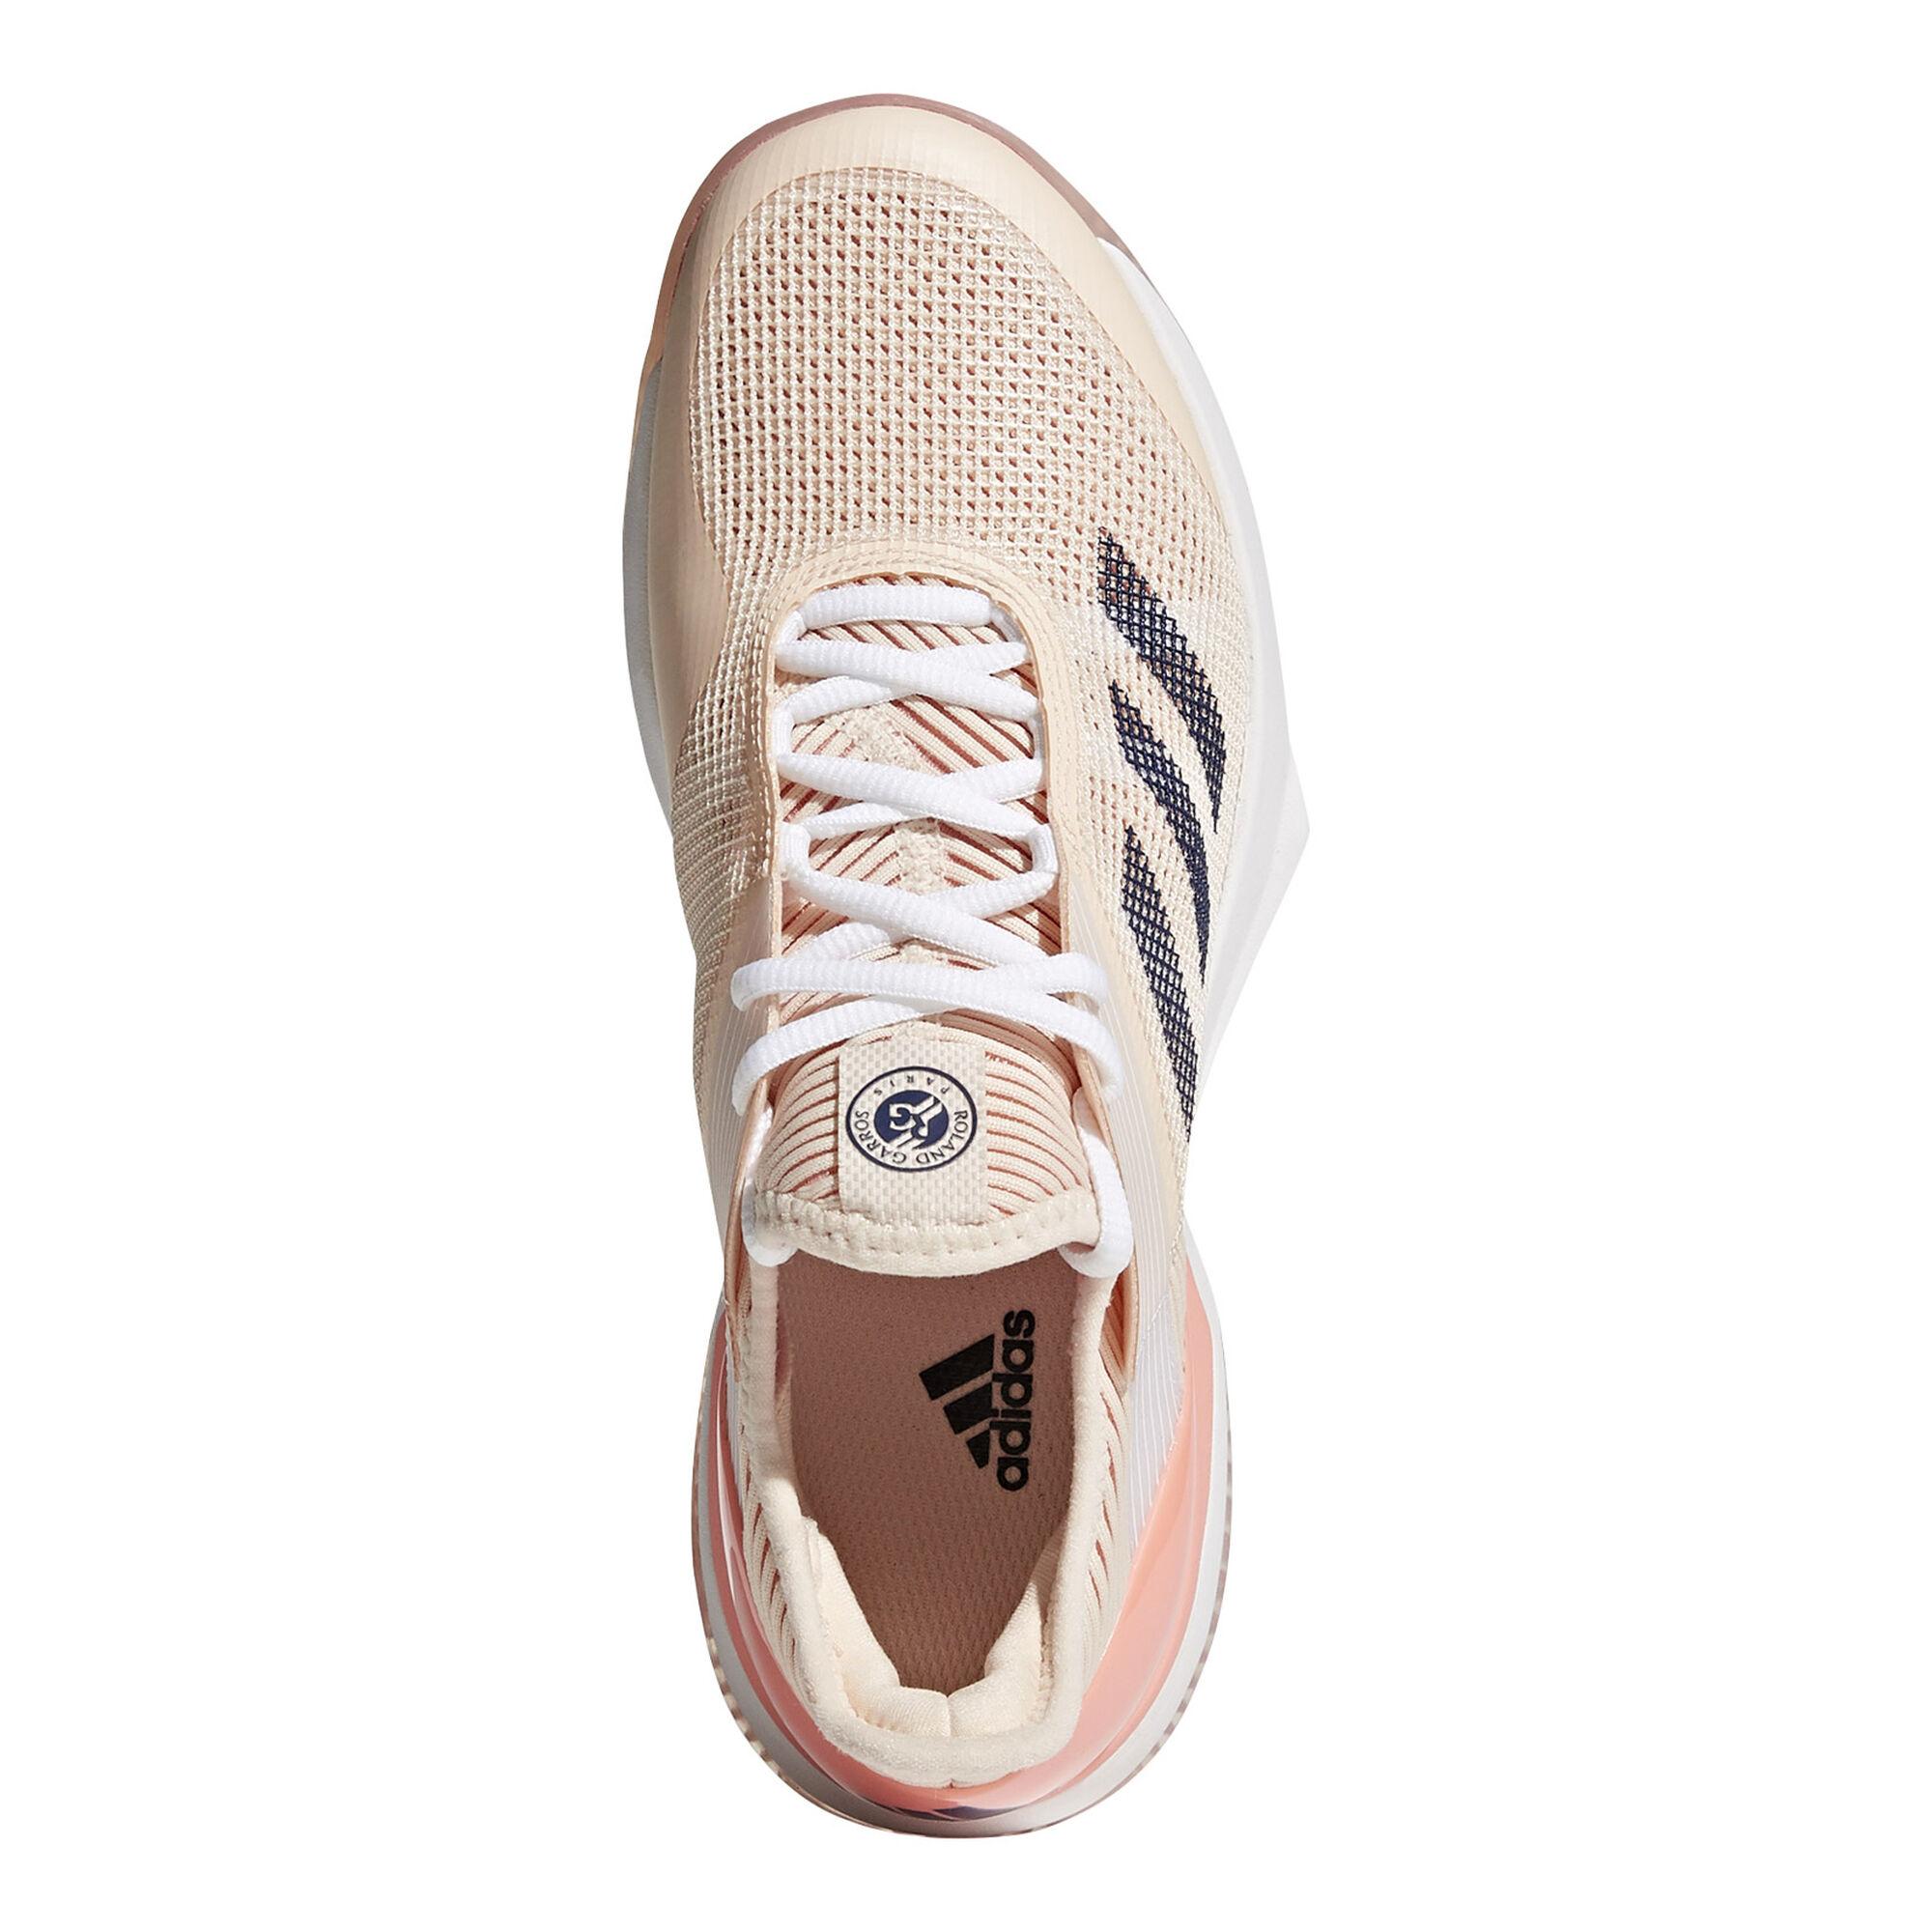 check out b6115 834e9 adidas adidas adidas adidas adidas adidas adidas adidas adidas  adidas adidas. Adizero Ubersonic 3 Clay ...